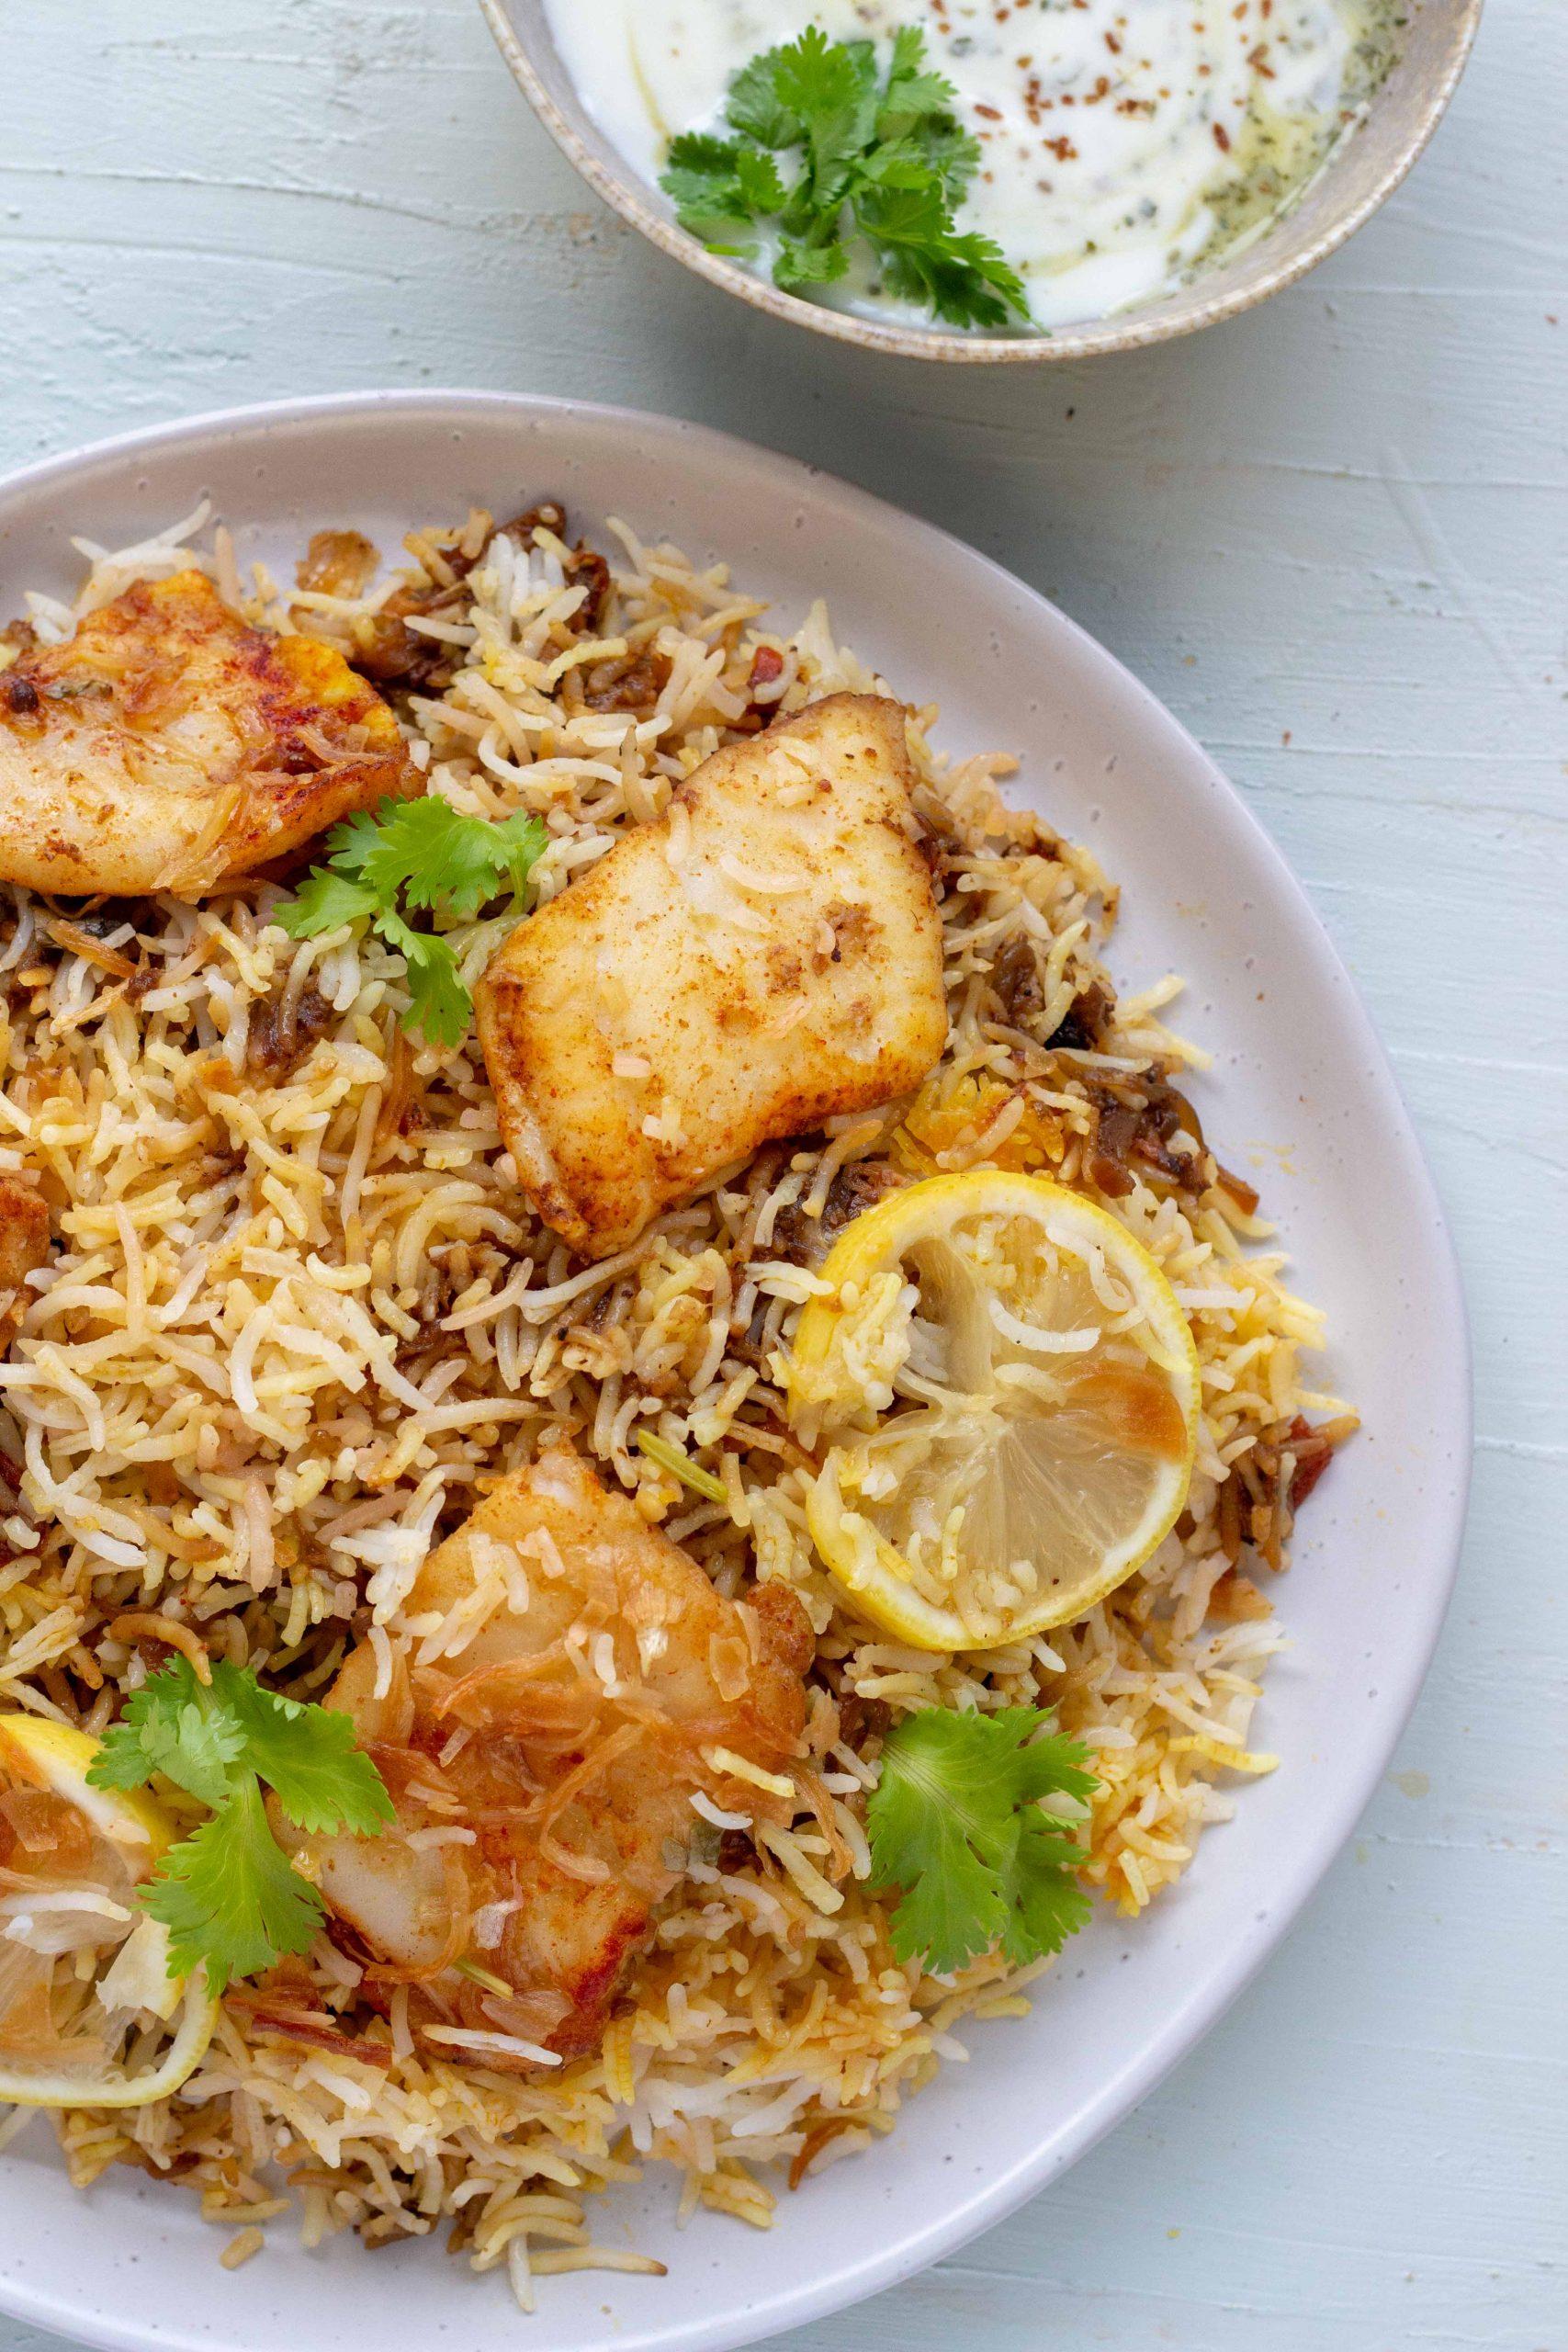 A plate of Pakistani style fish biryani with raita in the background.